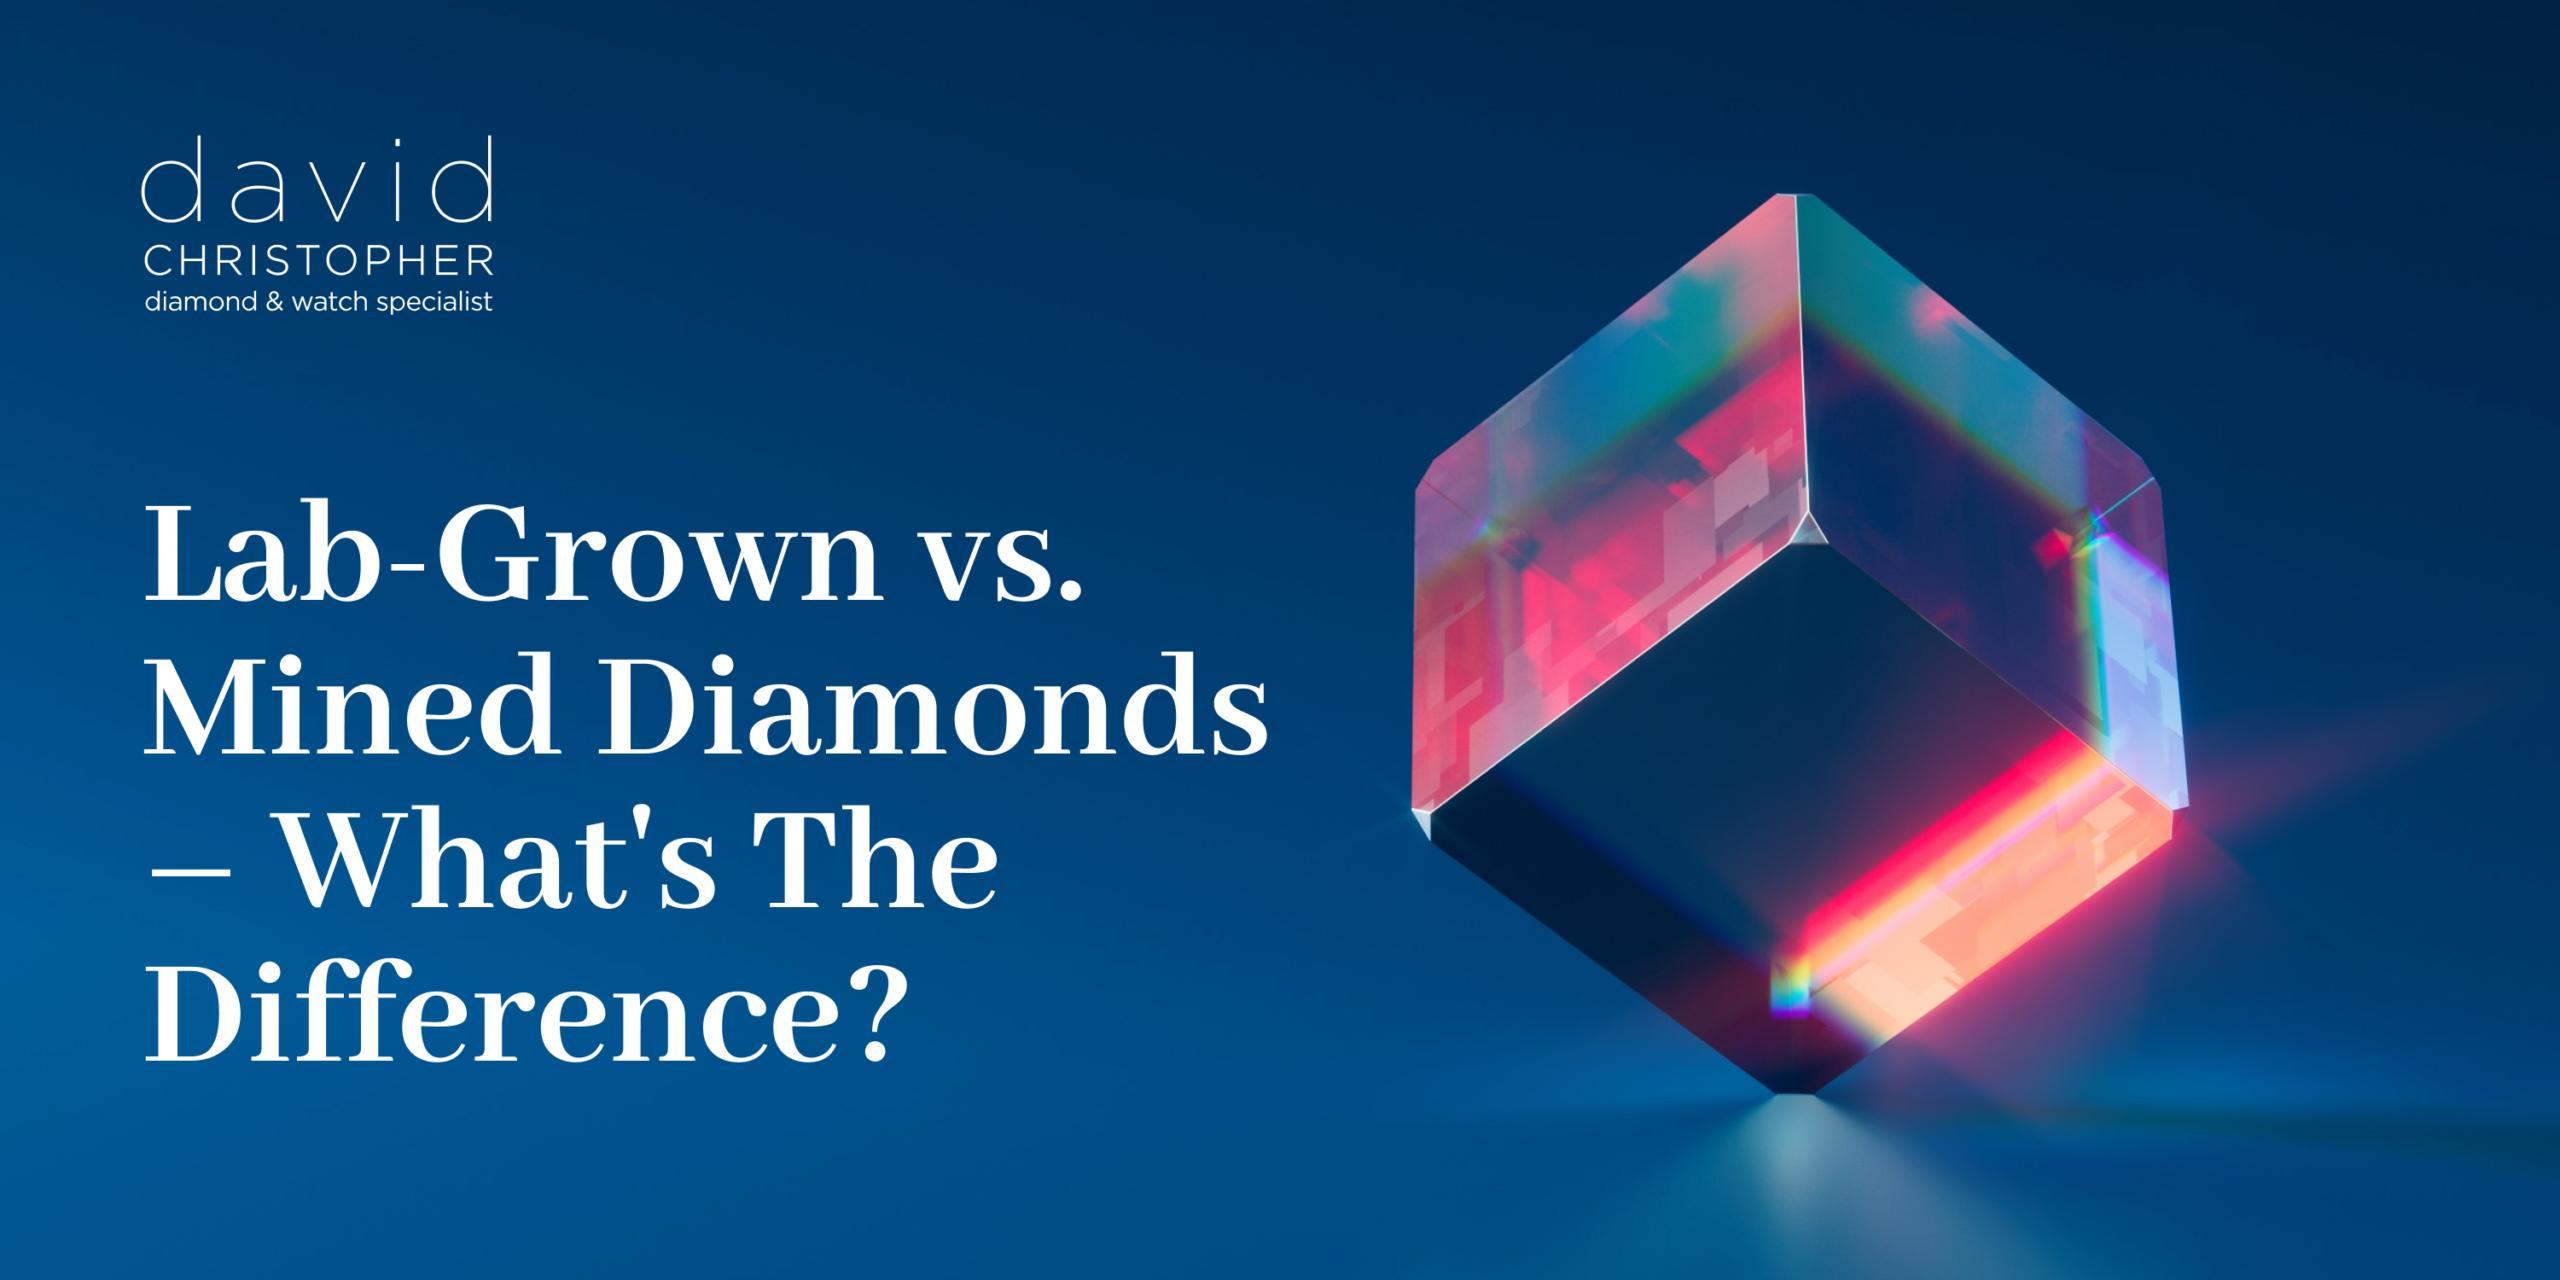 lab-grown-vs-mined-diamonds